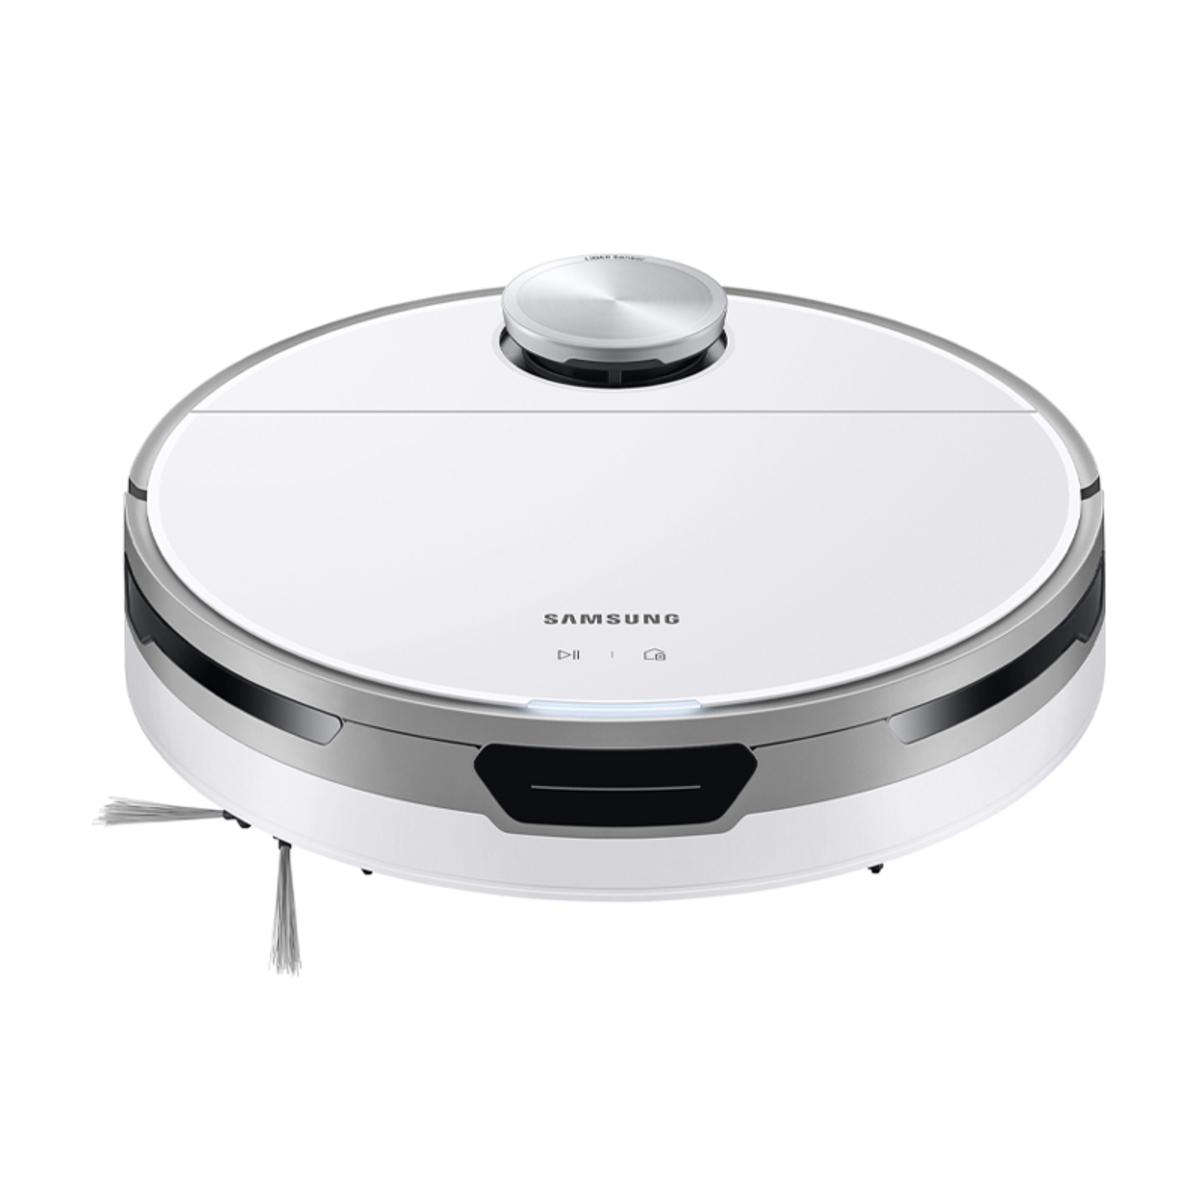 Samsung VR30T80313W Jet Bot+ Robot Vacuum Cleaner